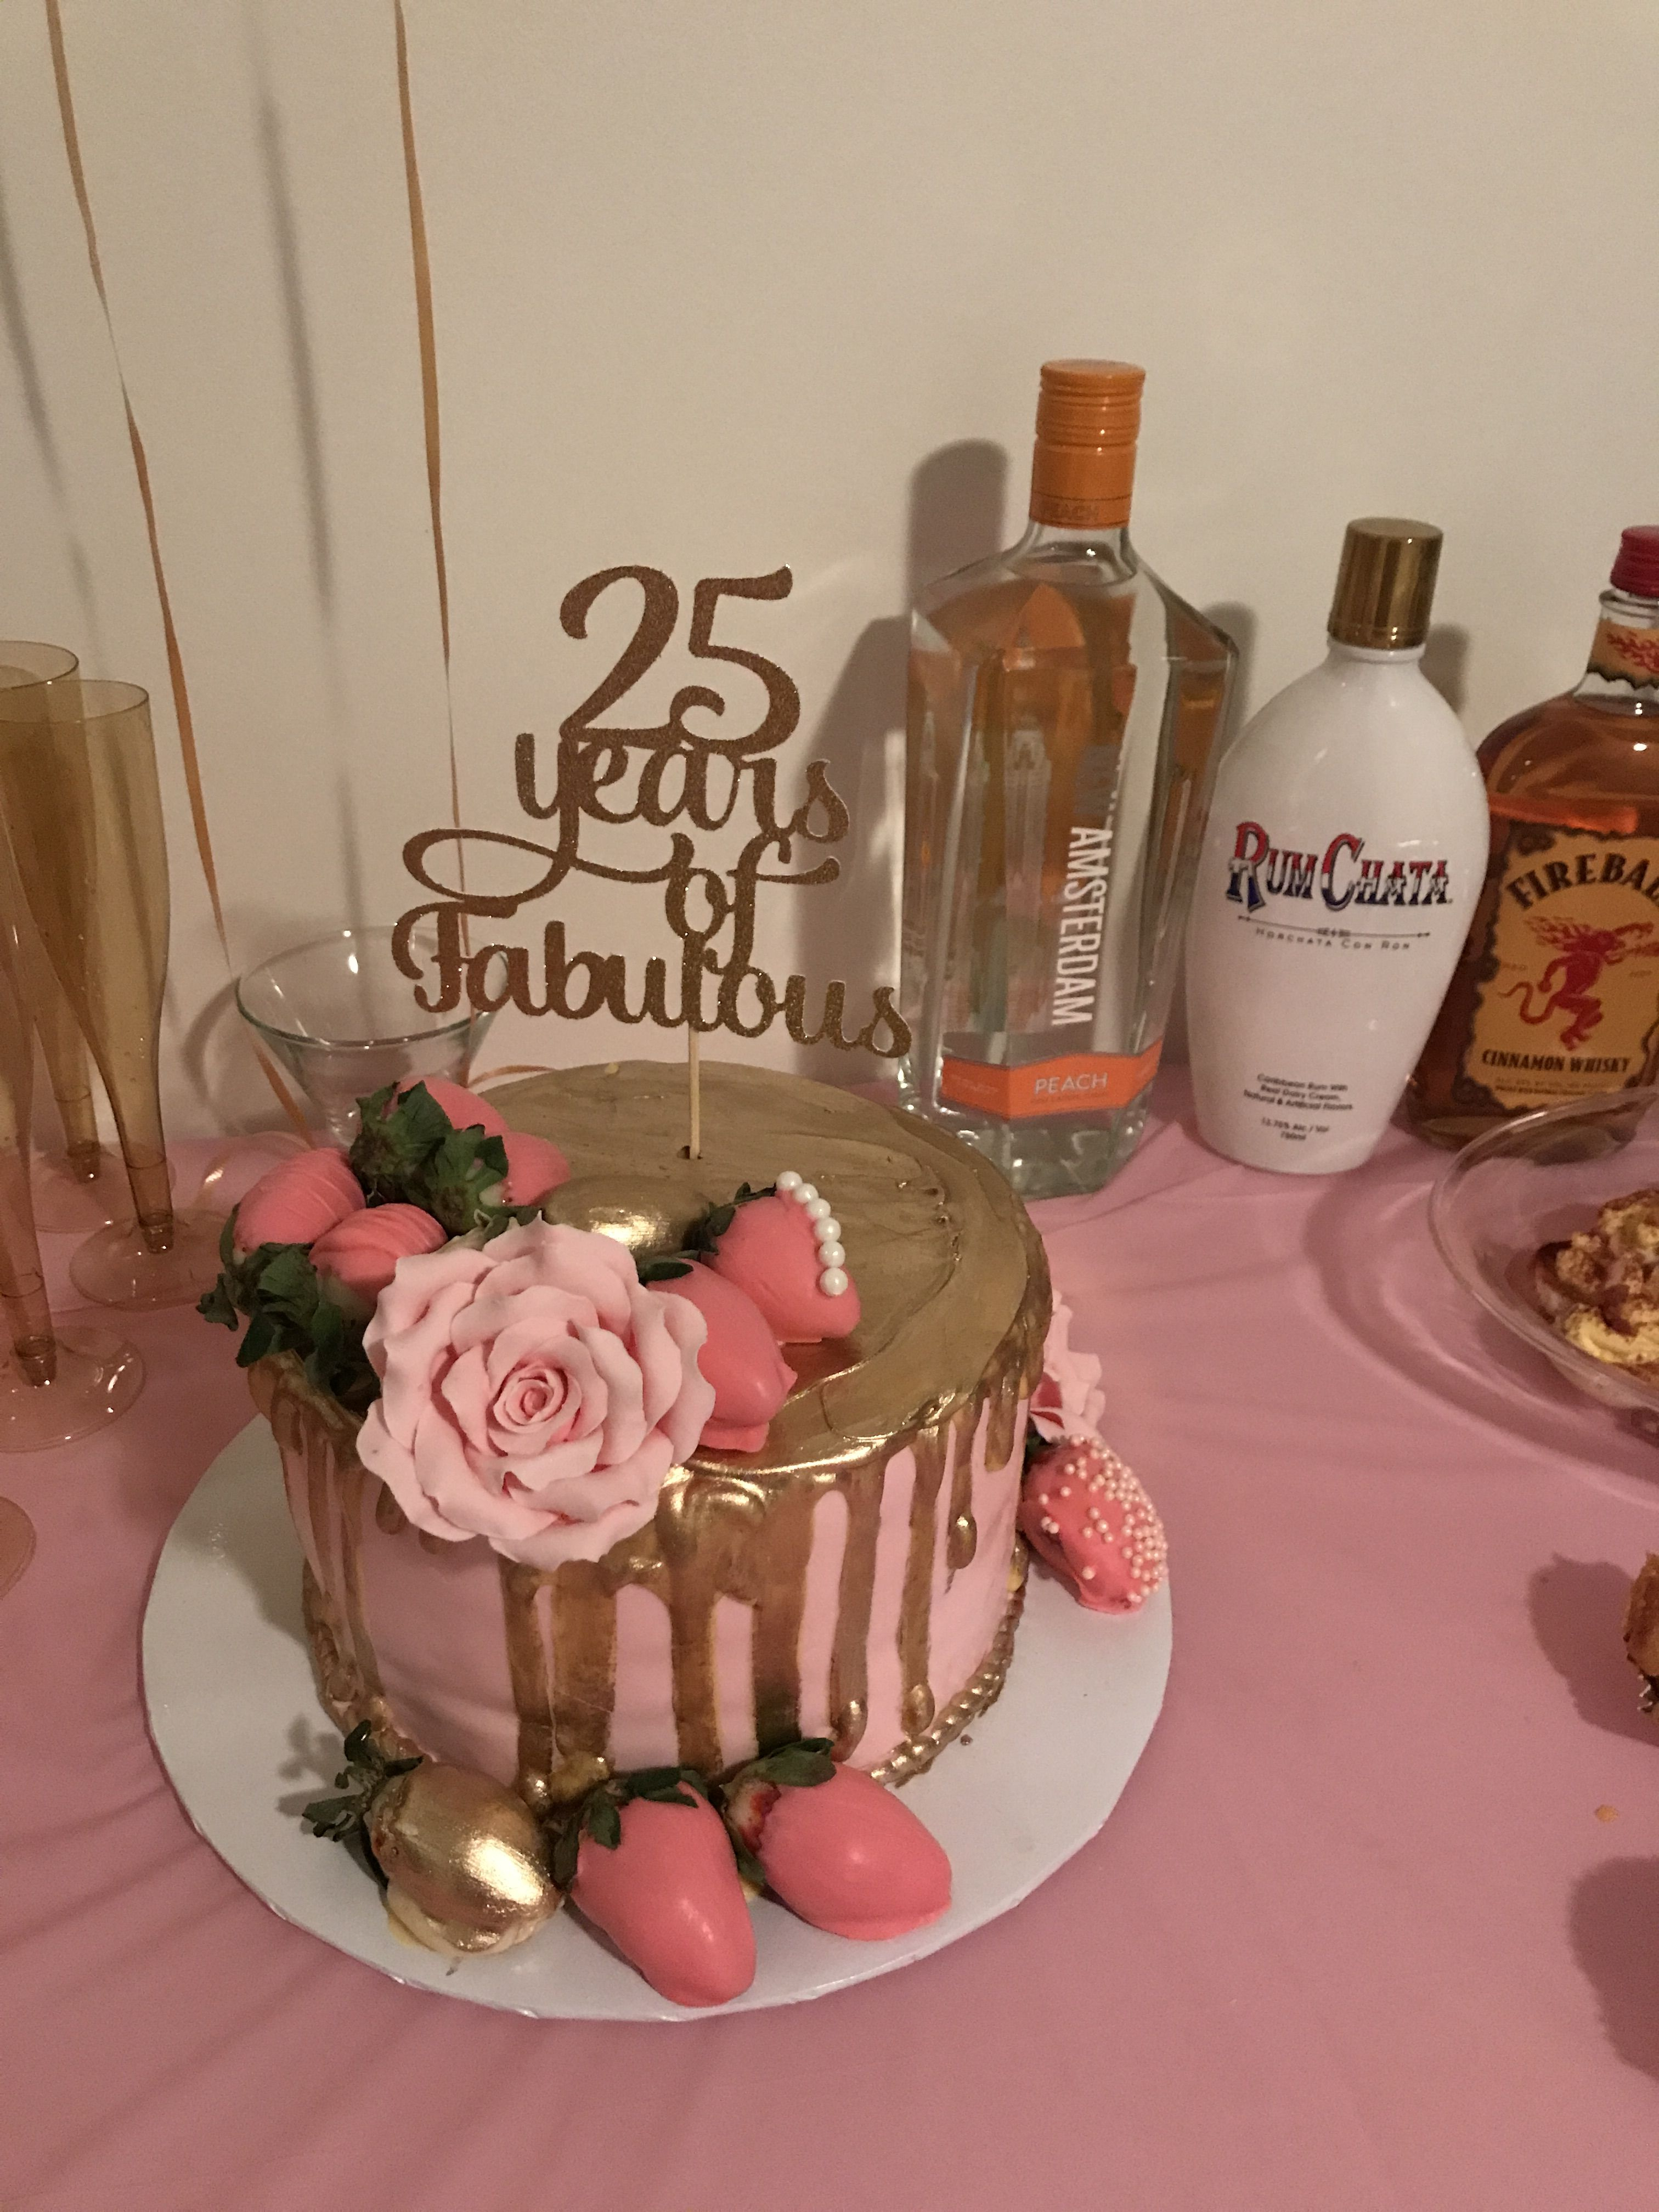 Pin By Alisha Black On My Bday Dinner 25th Birthday Cakes 29th